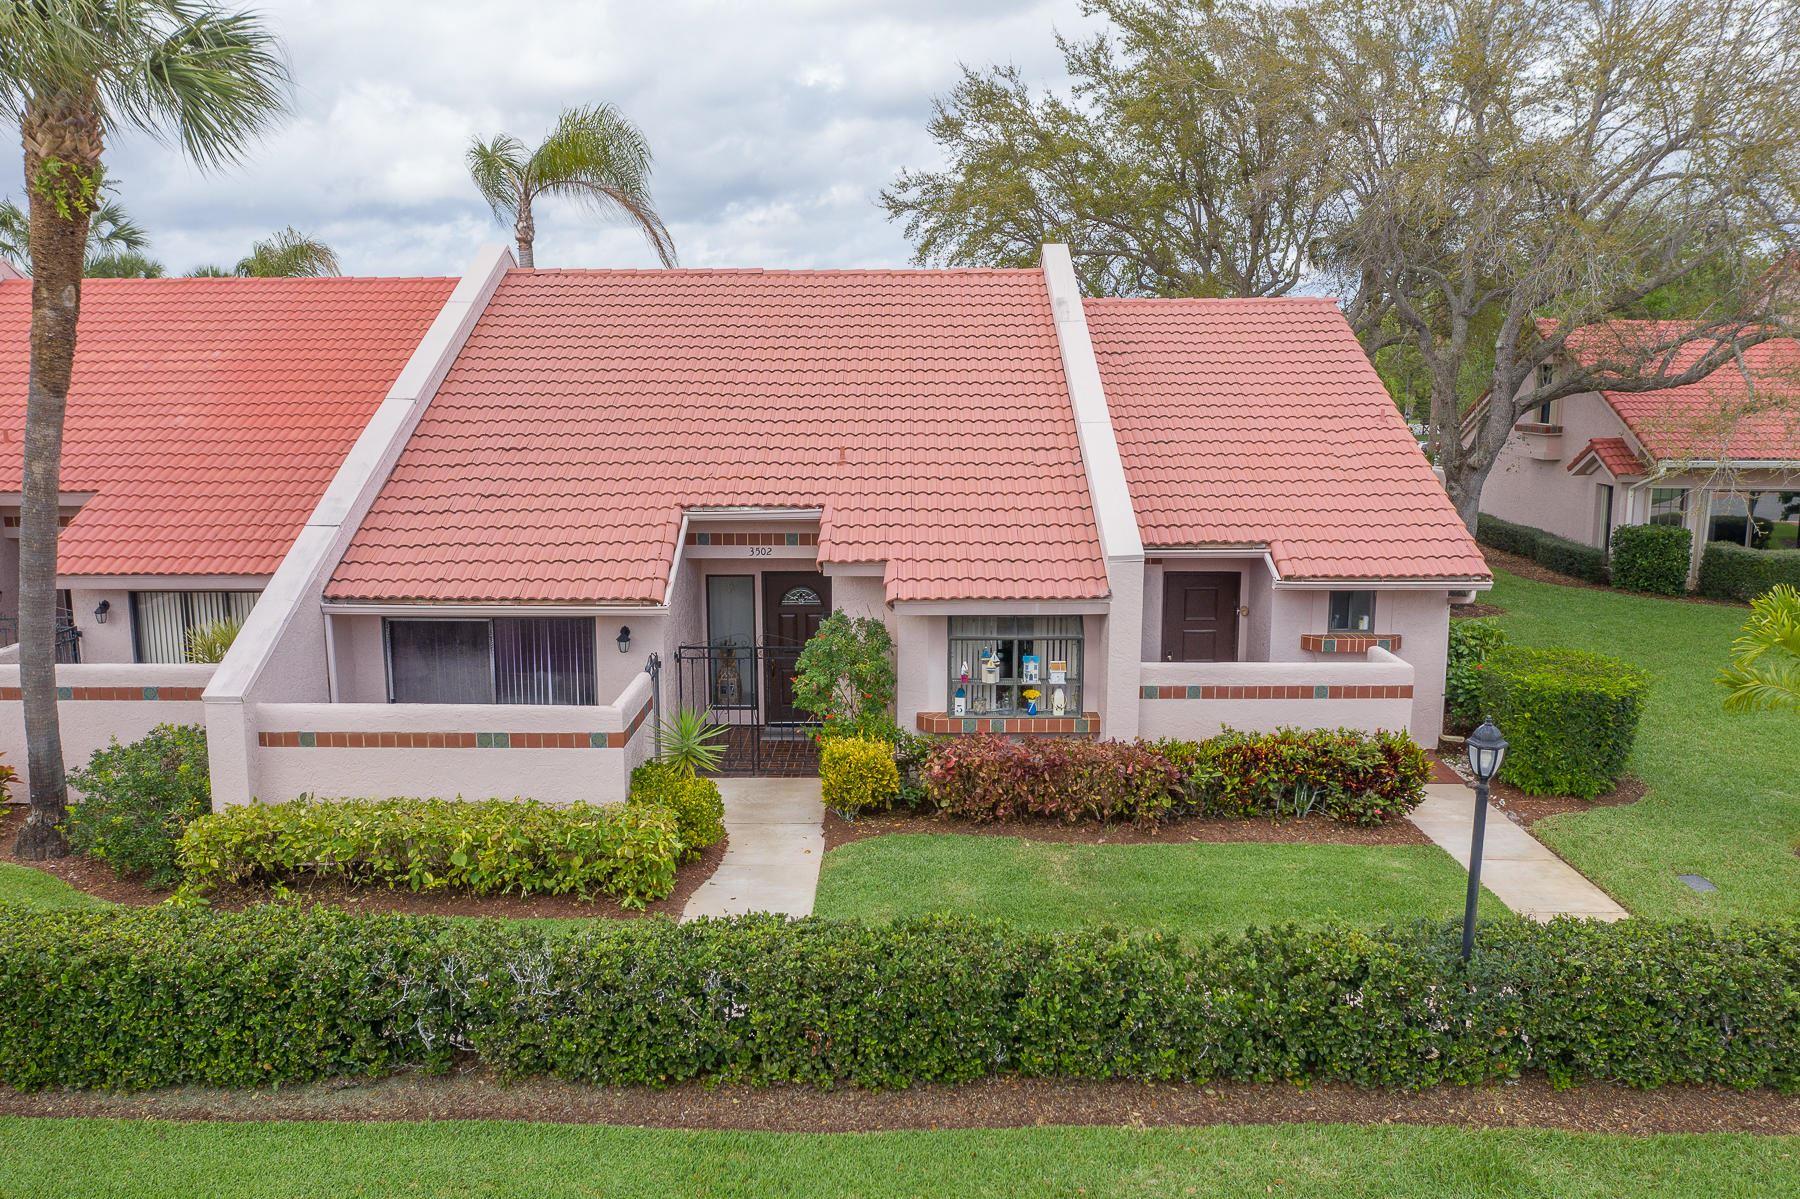 3502 SE Sandpiper Circle, Port Saint Lucie, FL 34952 - #: RX-10696994